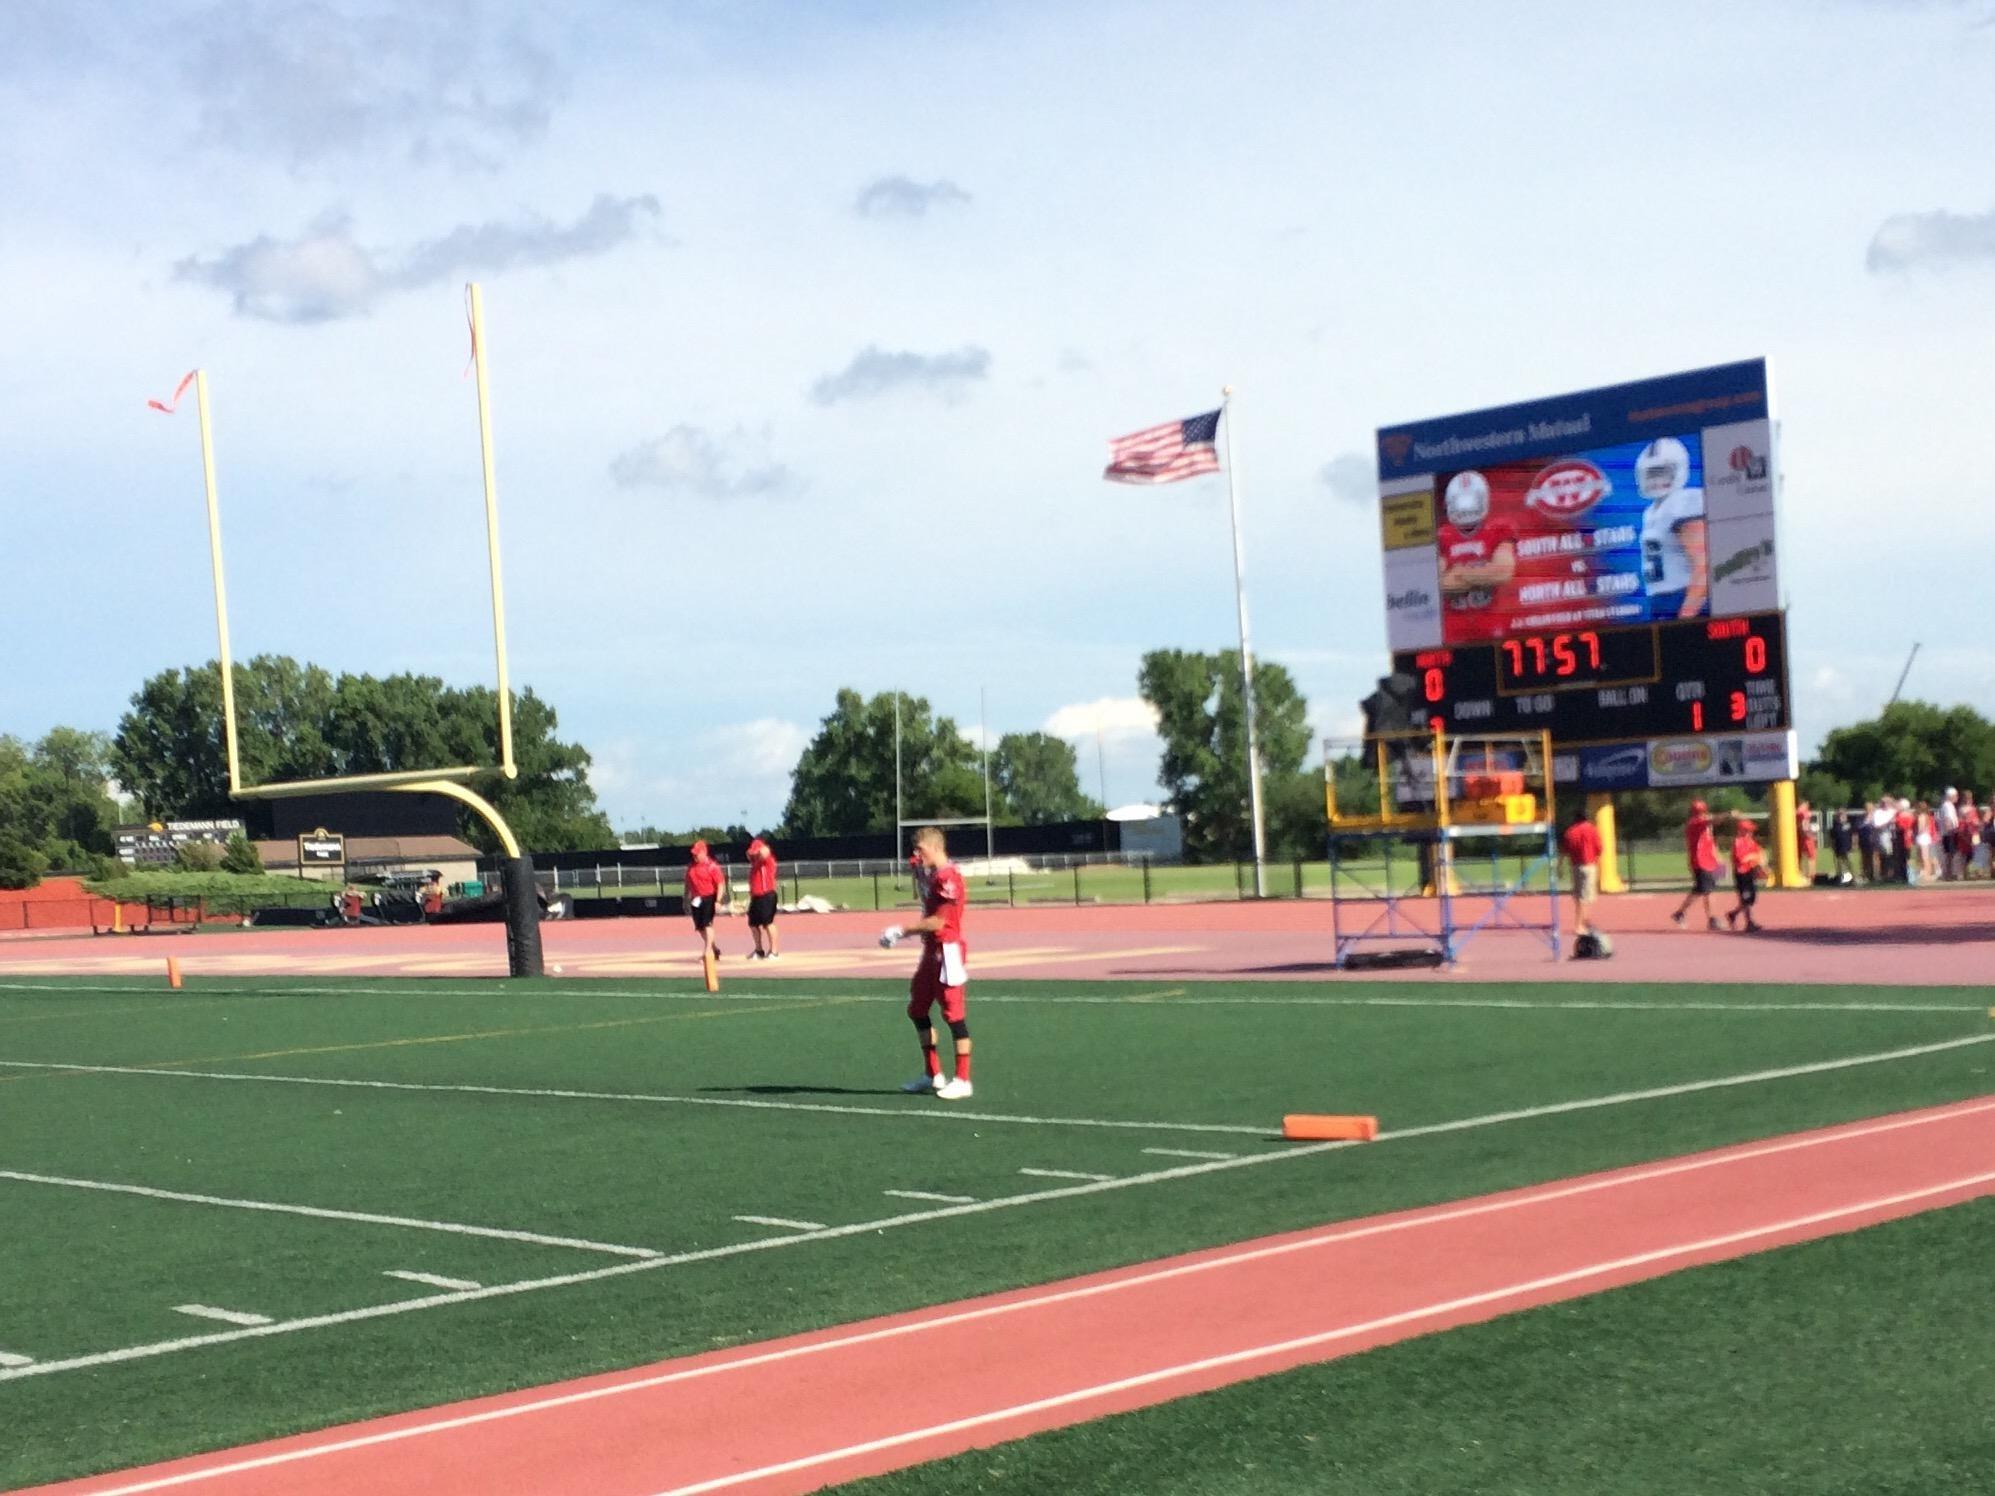 The WFCA All-Star games were held at Titan Stadium in Oshkosh Saturday.